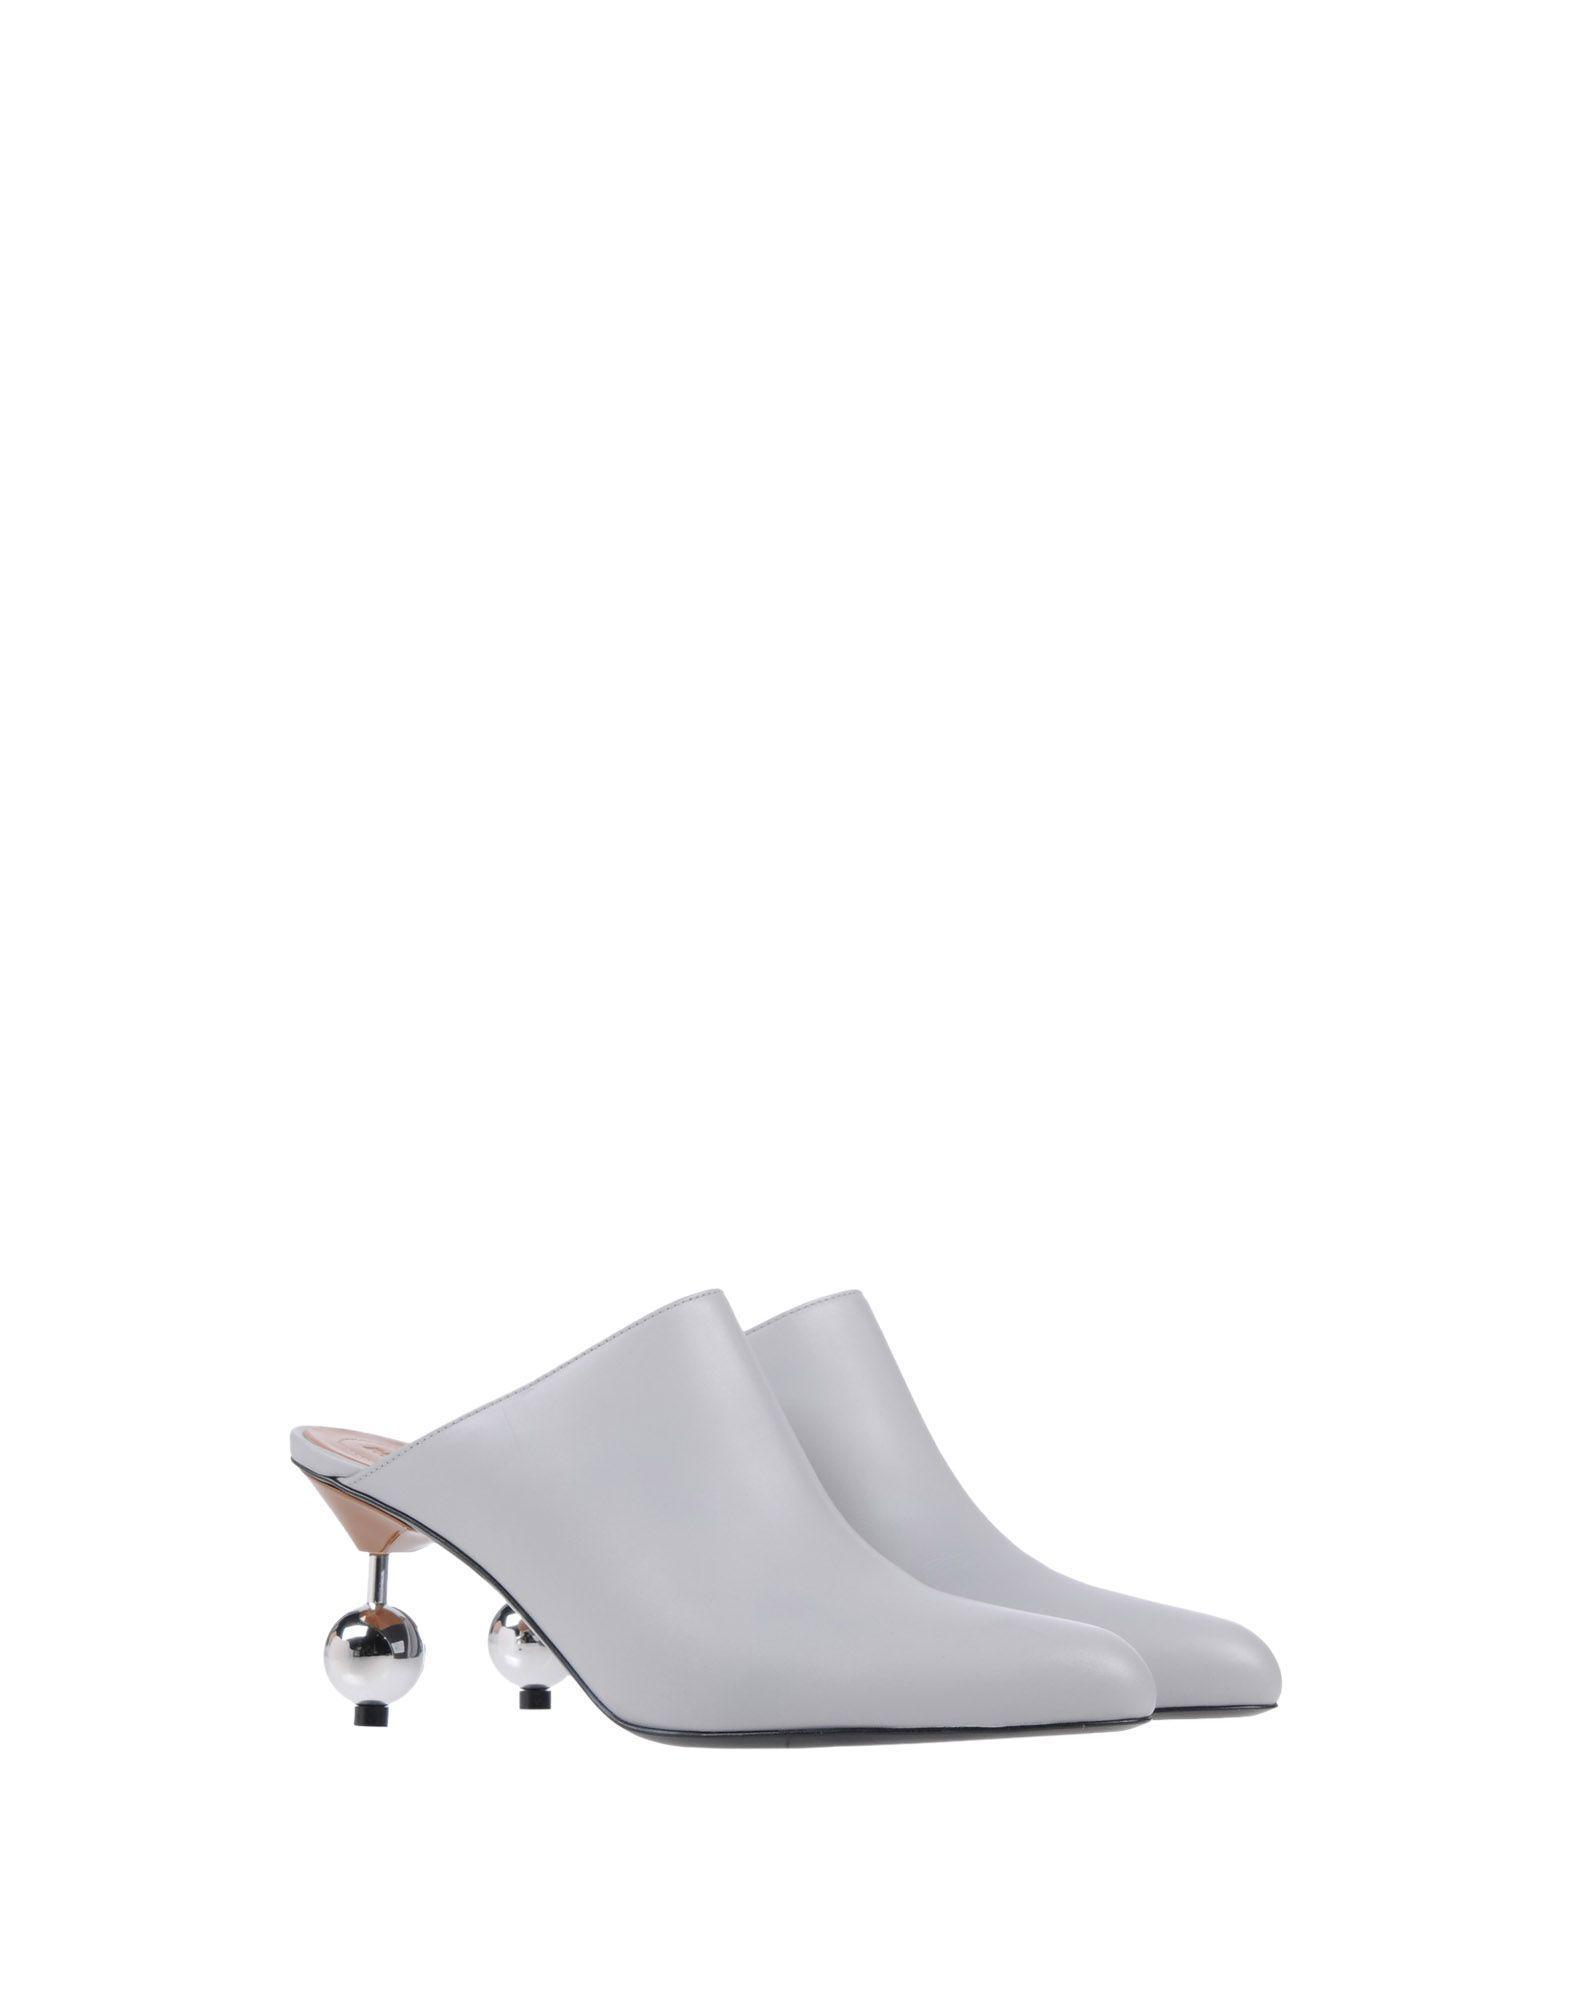 Marni Pantoletten Damen Schuhe  11447516UNGünstige gut aussehende Schuhe Damen 10ffd3